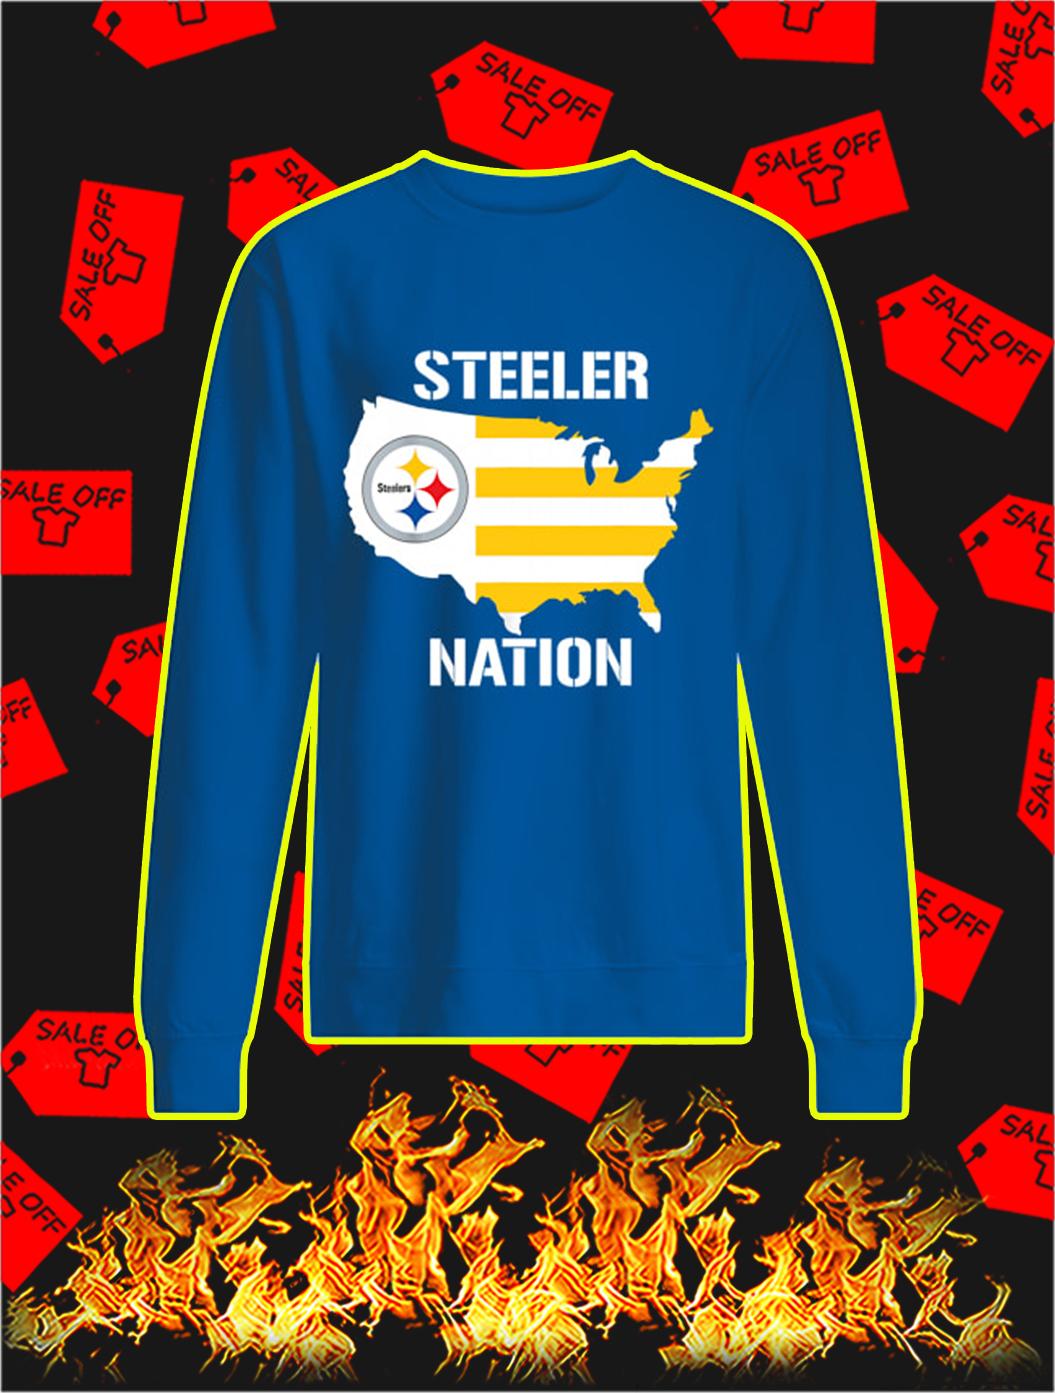 Steeler Nation sweatshirt